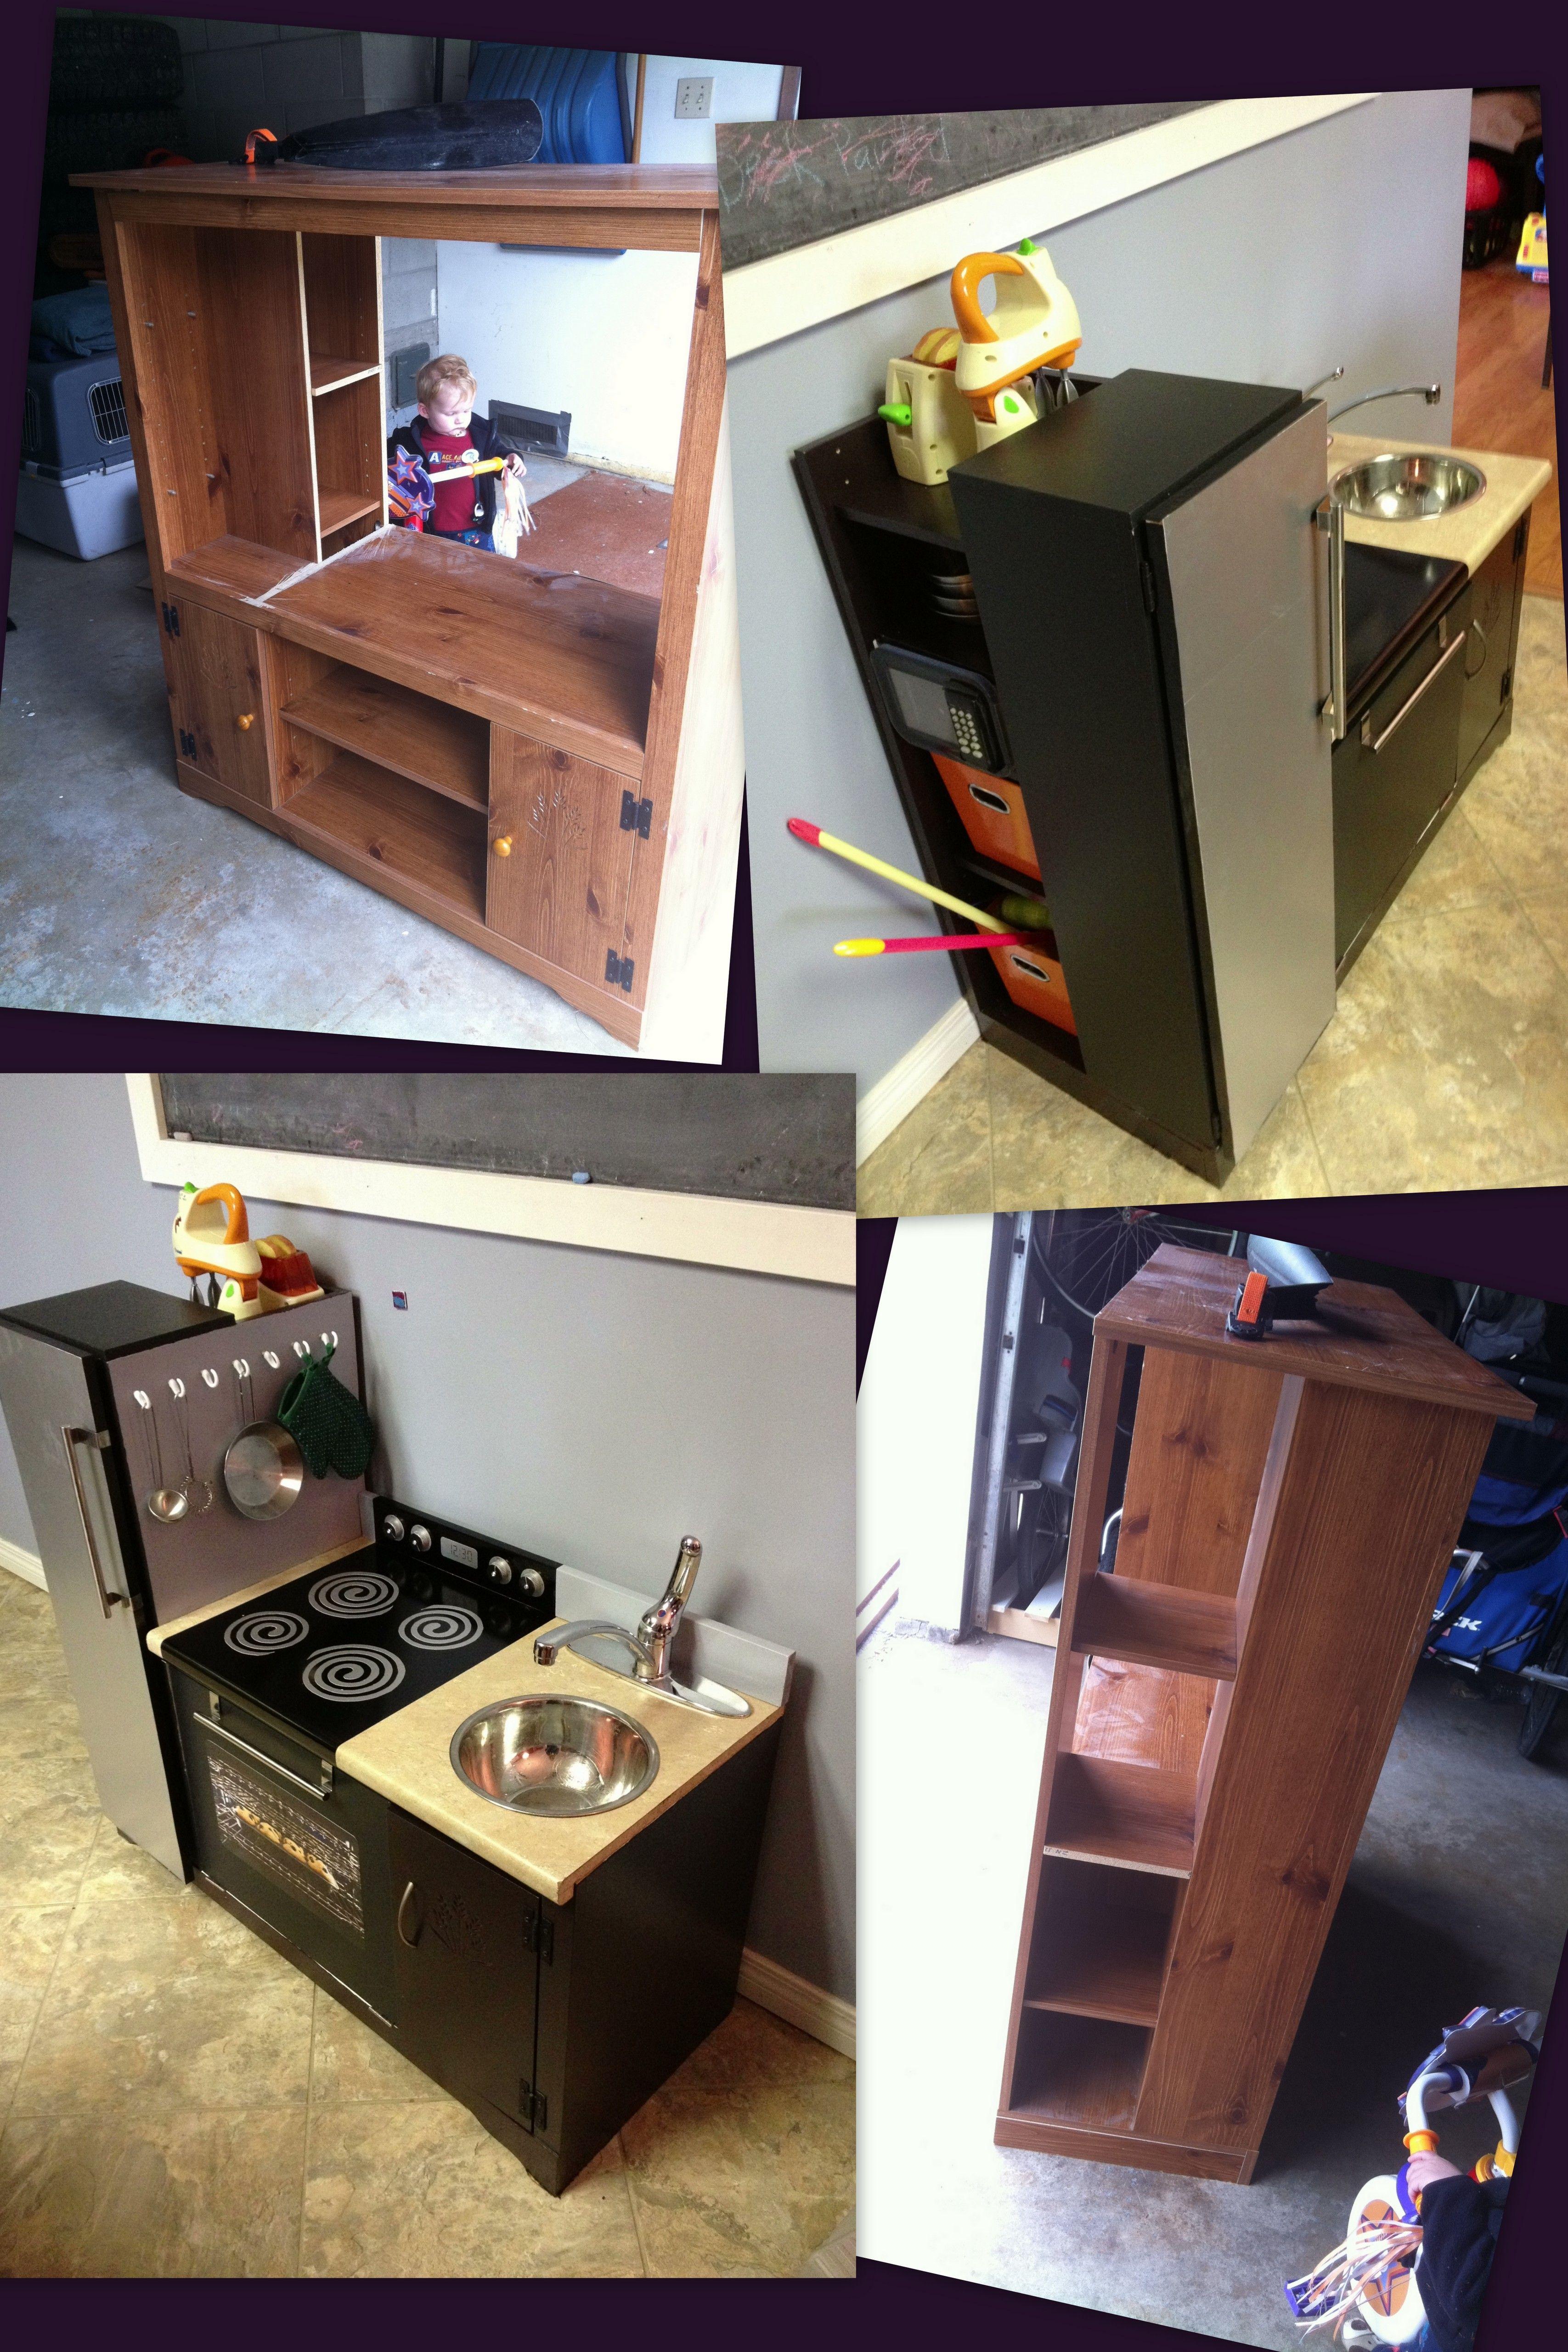 transformed old entertainment center into kids kitchen set! we